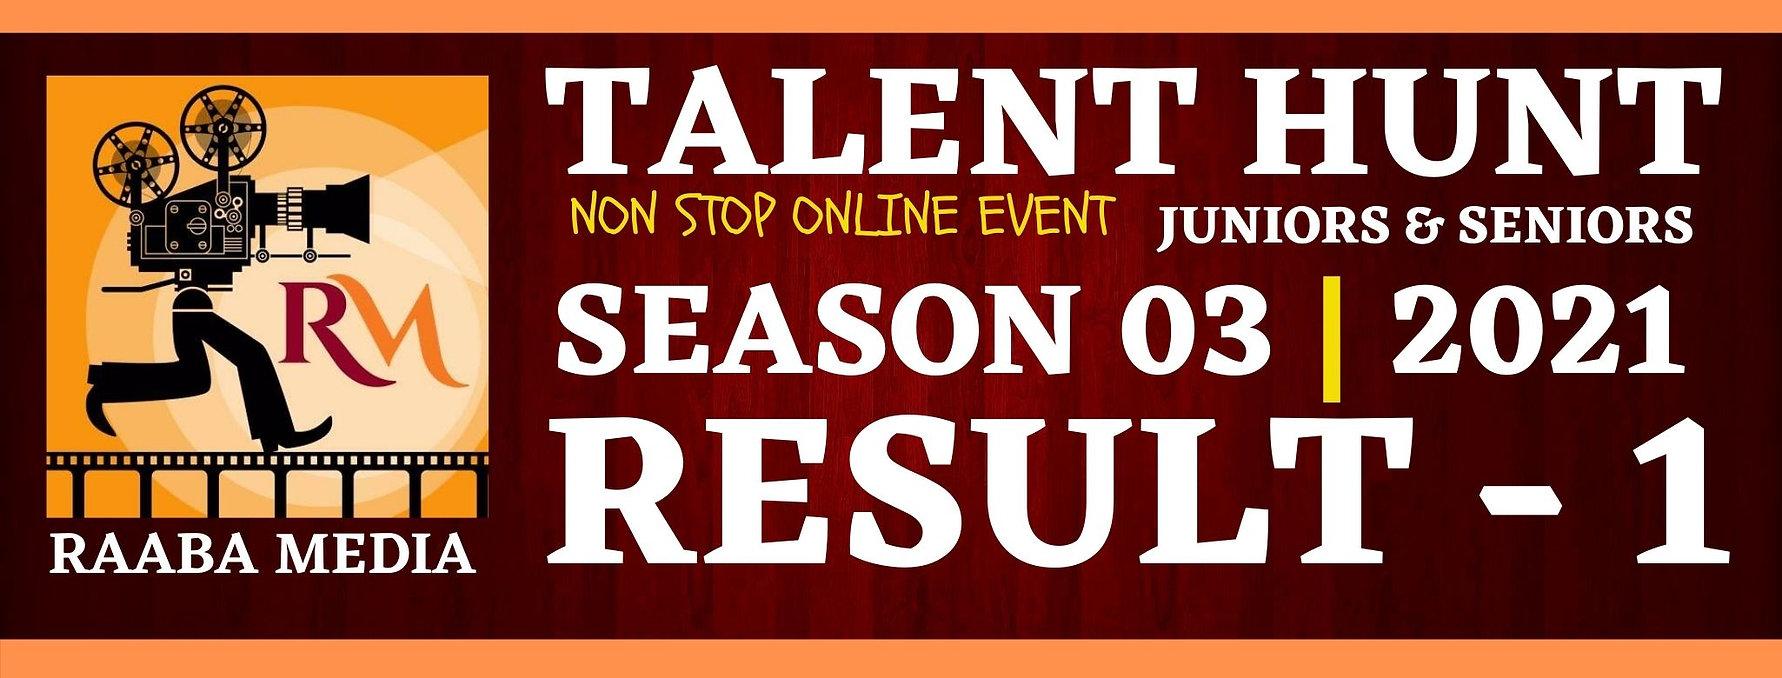 talent hunt non stop online event (1).jp